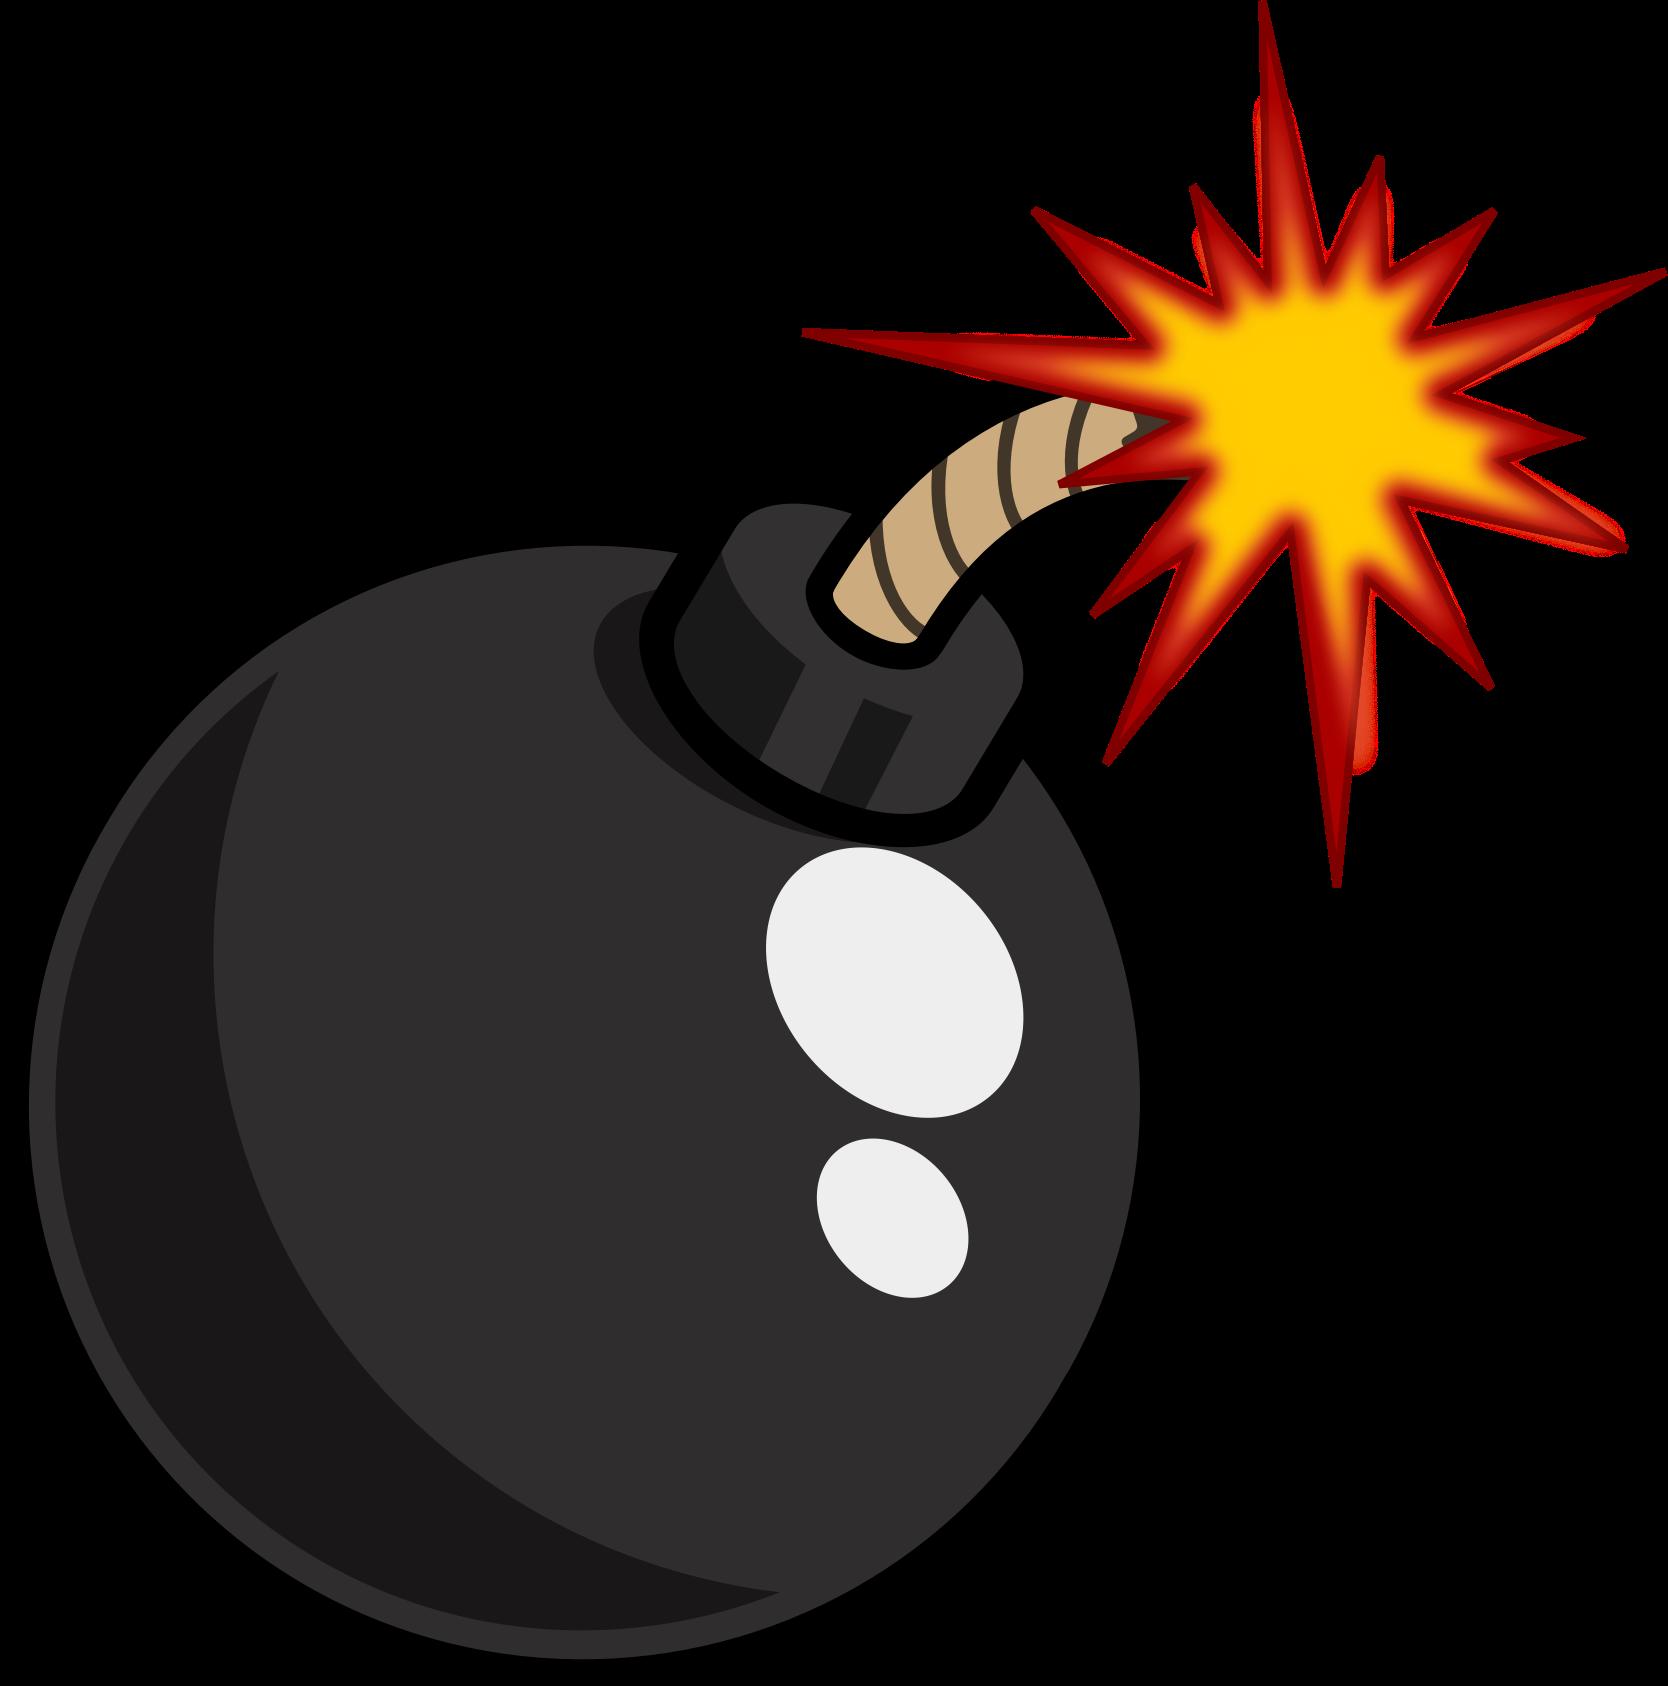 Bomb PNG.